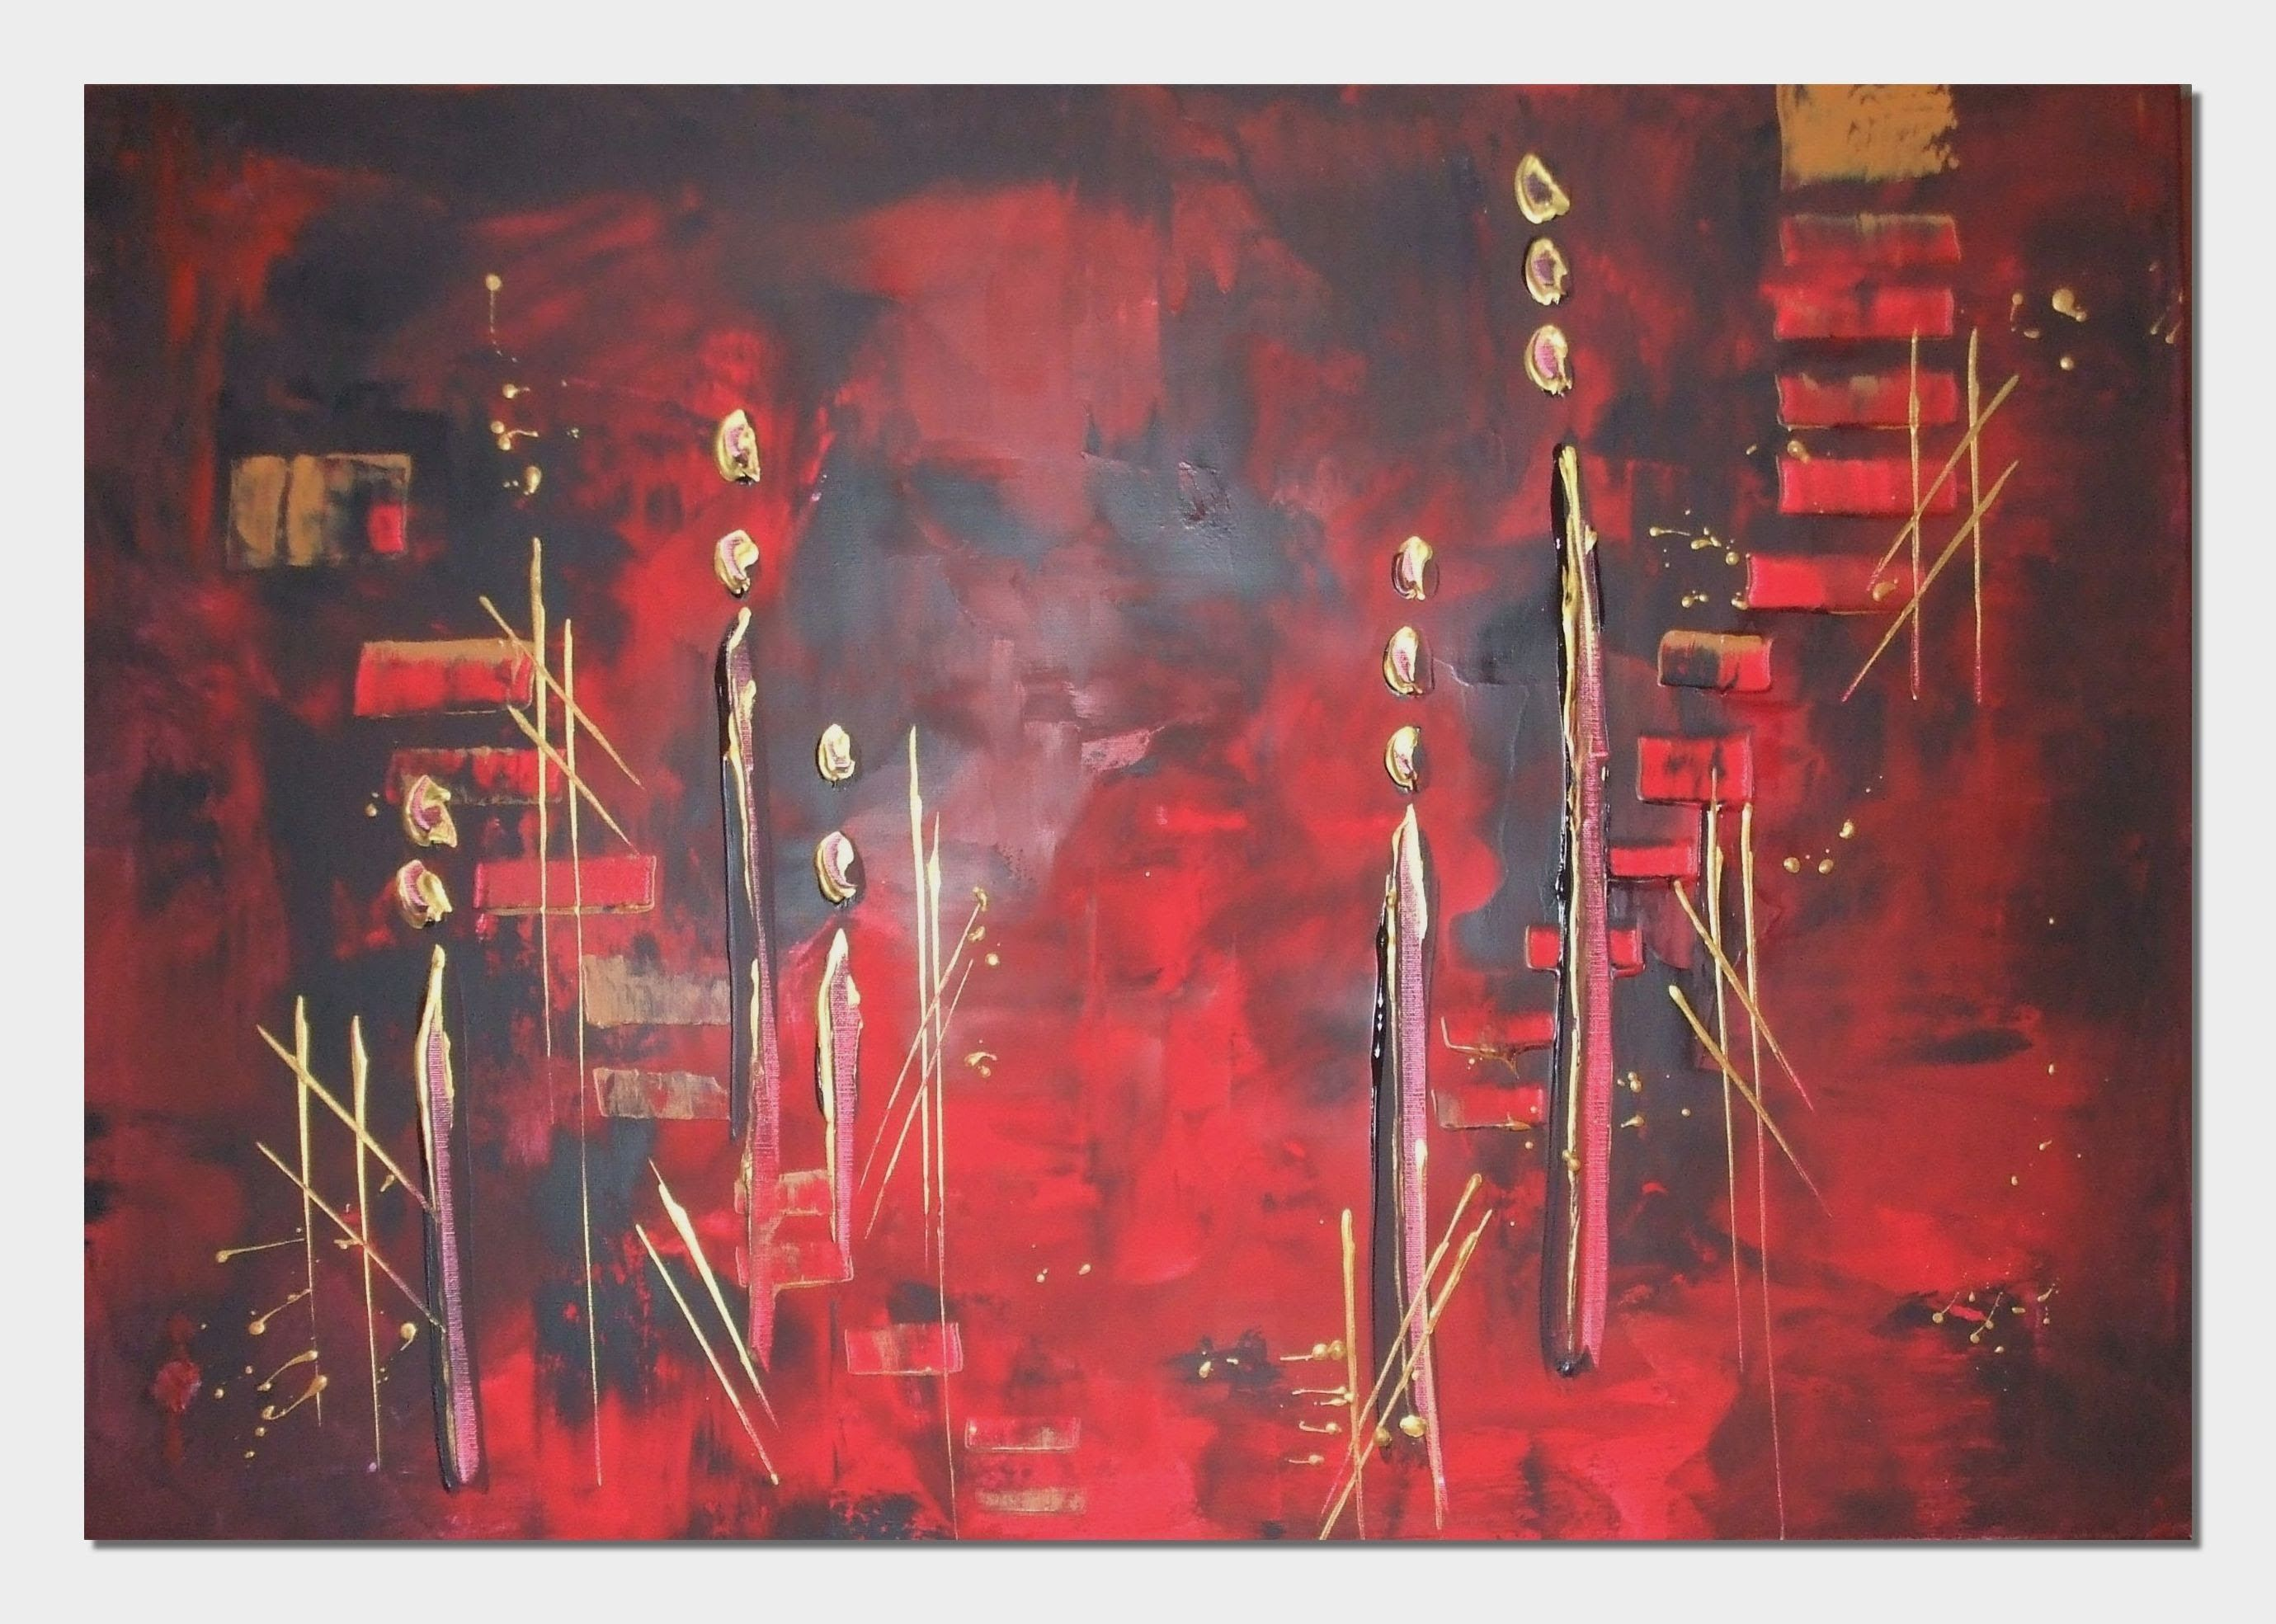 acrylmalerei spachteln acrylic painting spackling | peintures